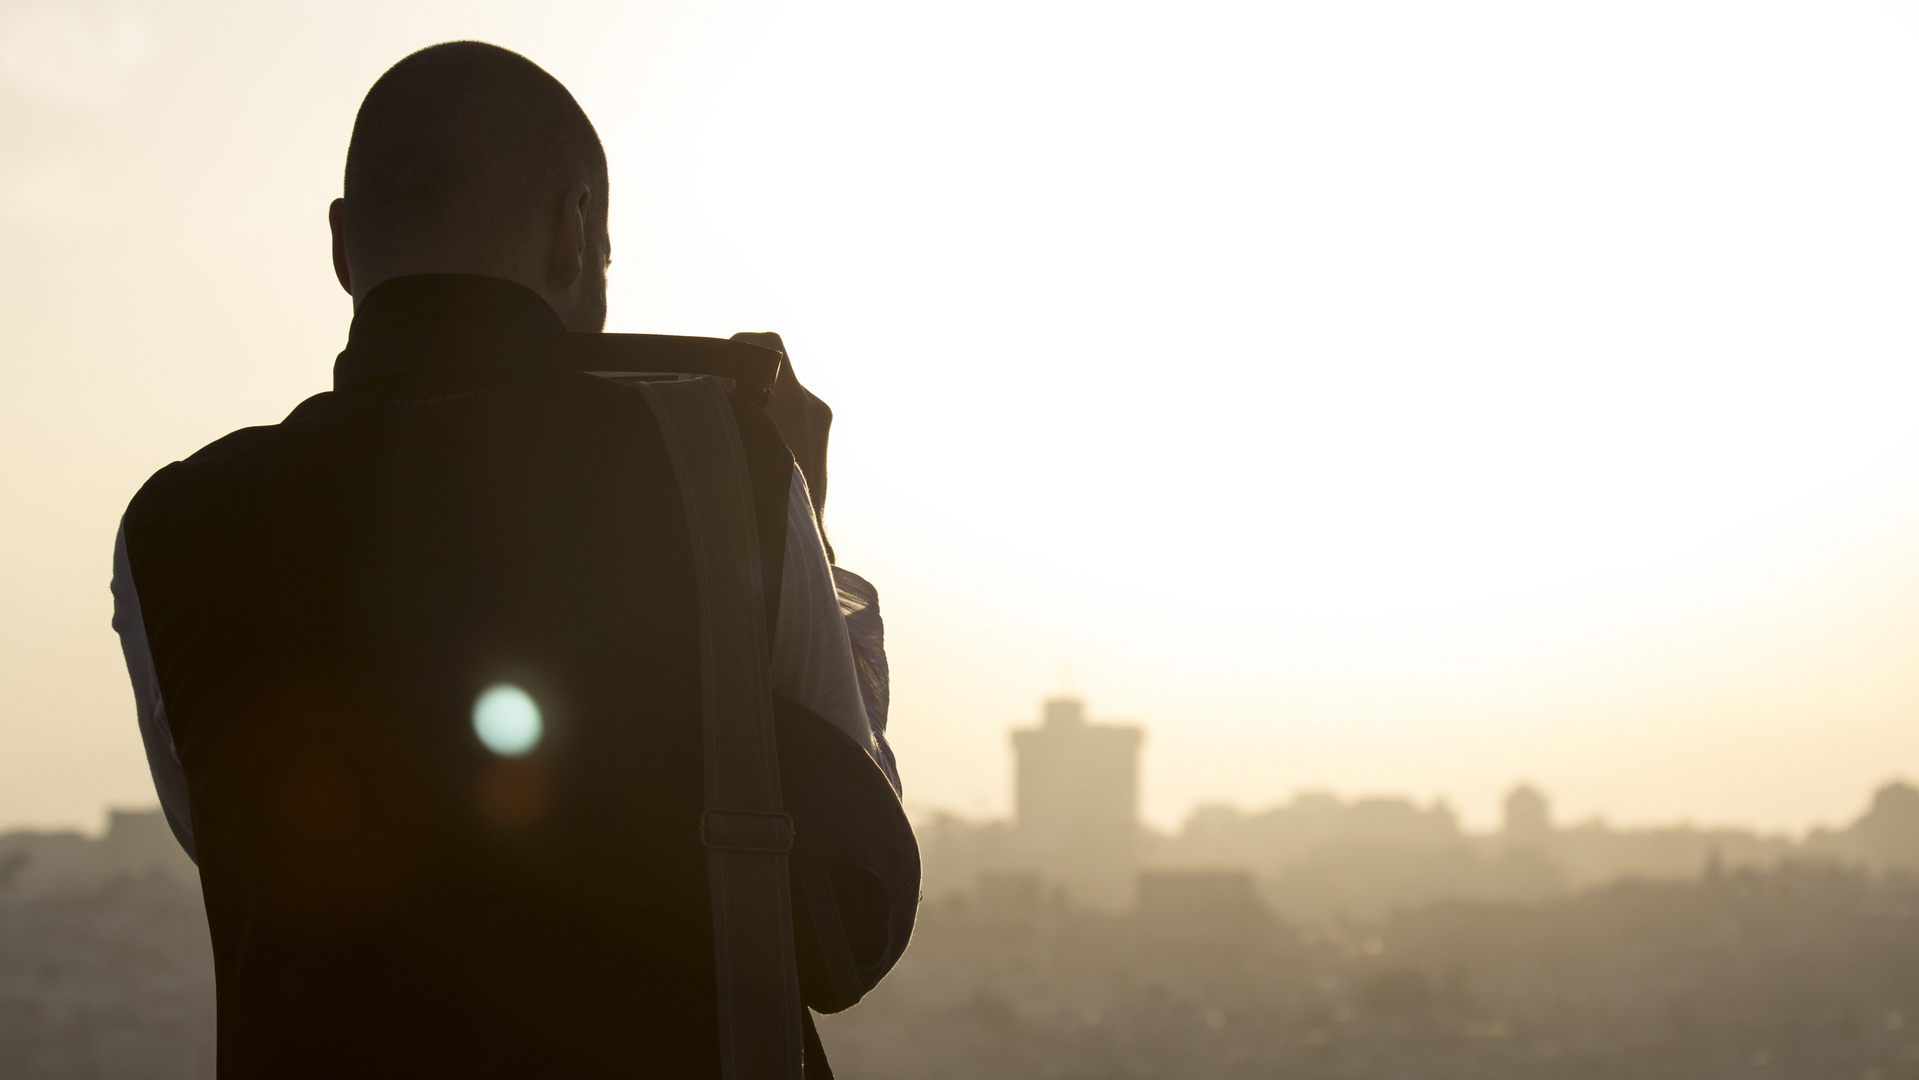 Jeruschalajim / al-Quds (Fotograf)